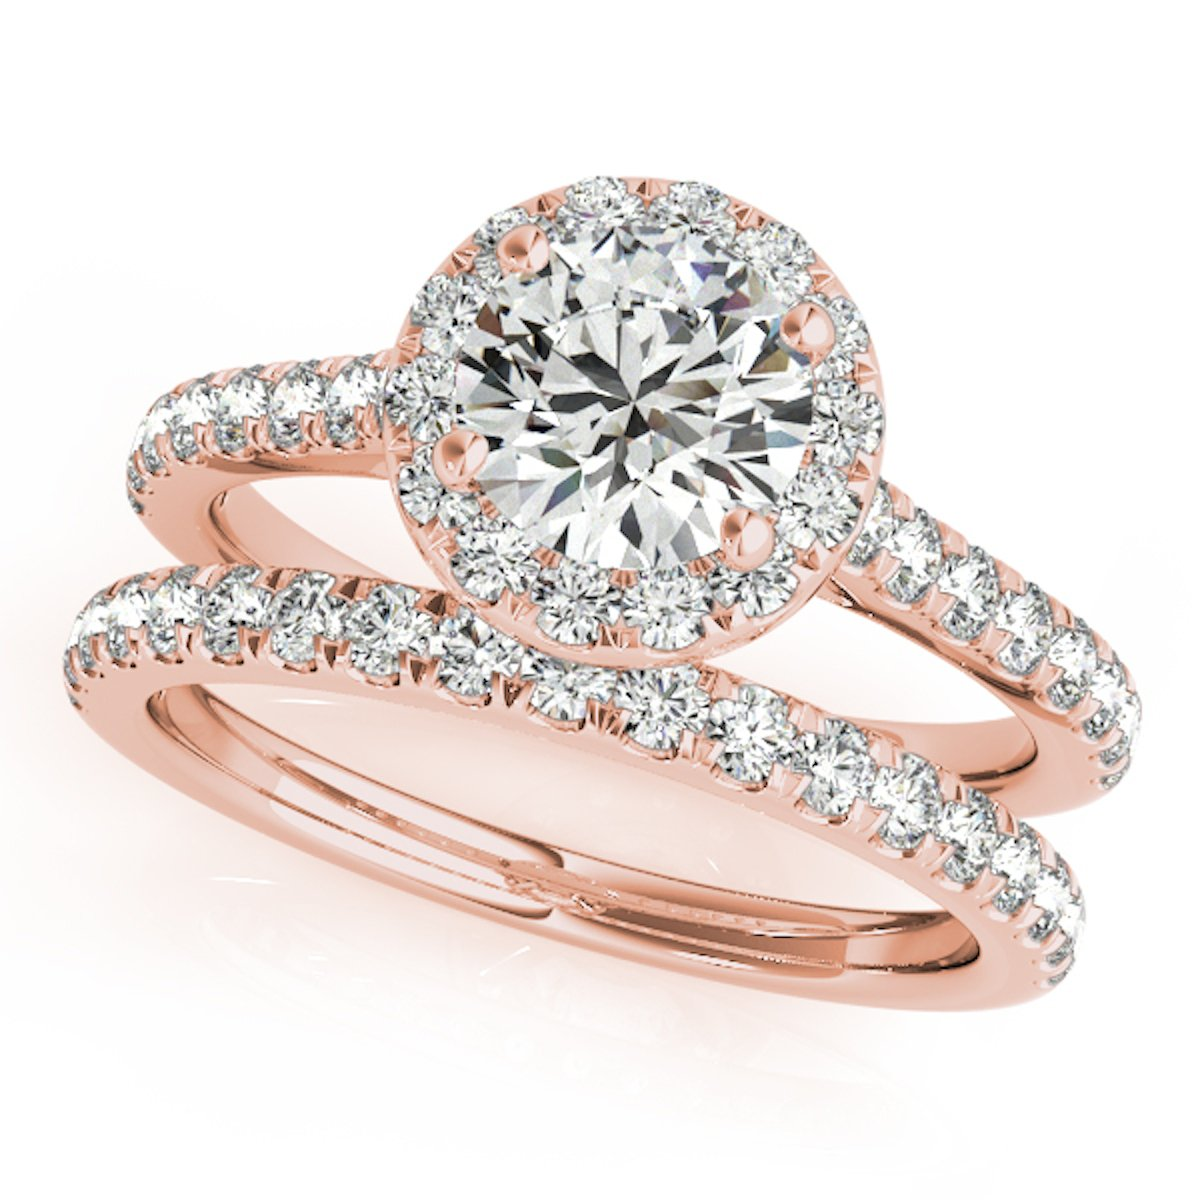 0.75 Ct. Diamond Engagement Bridal Ring Set 14K Solid Rose Gold